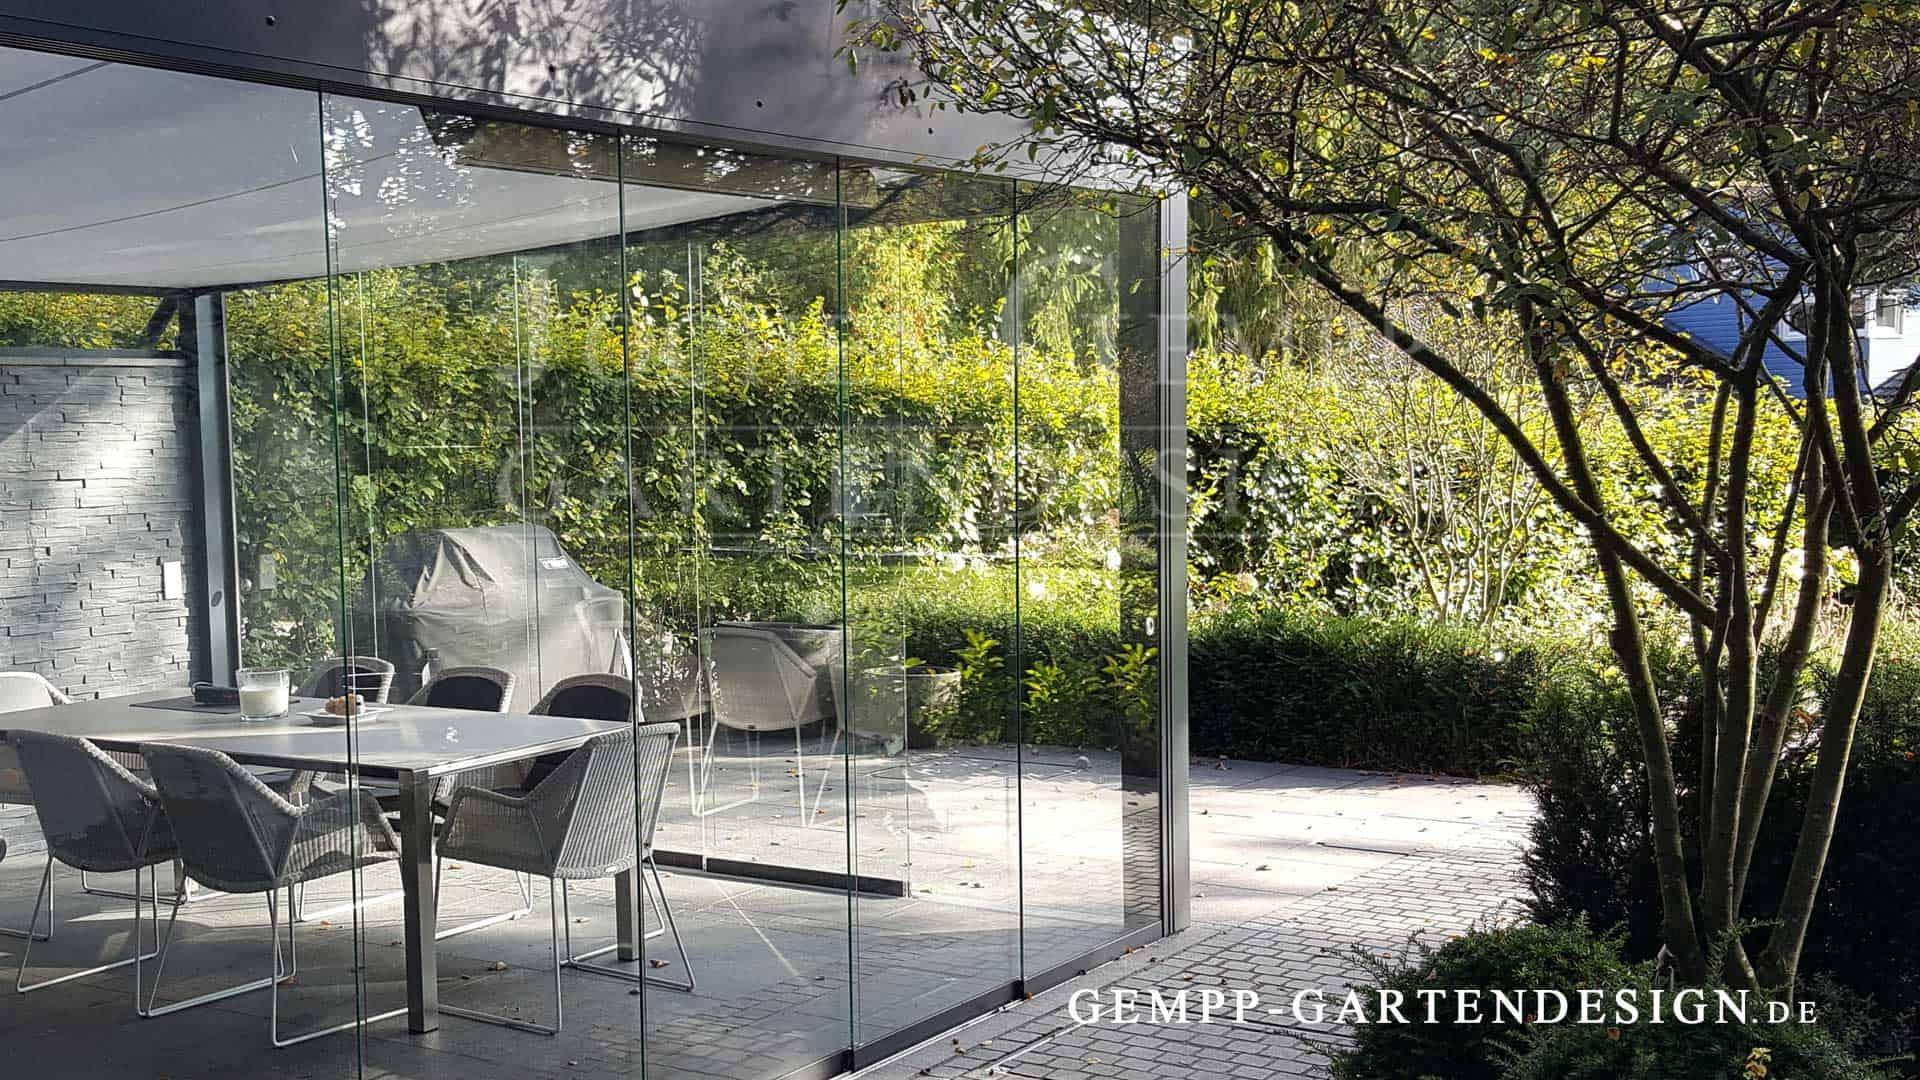 berdachung terrasse alu glas terrassen berdachung gempp gartendesign. Black Bedroom Furniture Sets. Home Design Ideas